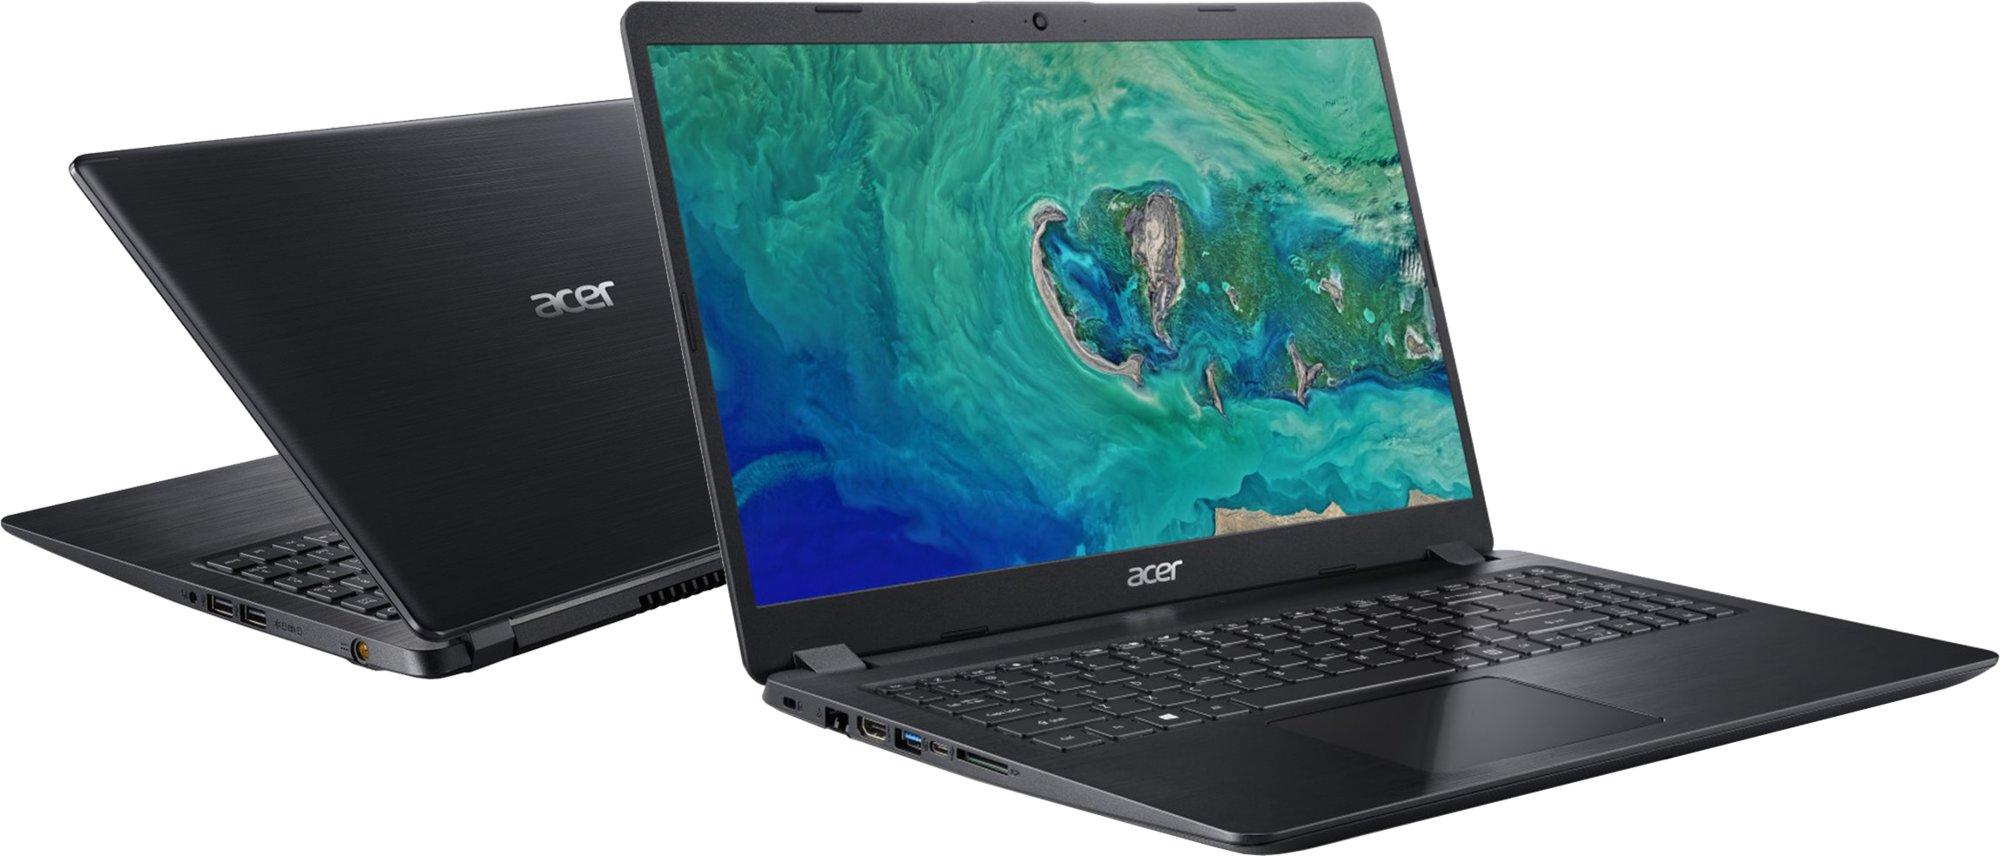 Acer Aspire 5 A515-52G-77D4